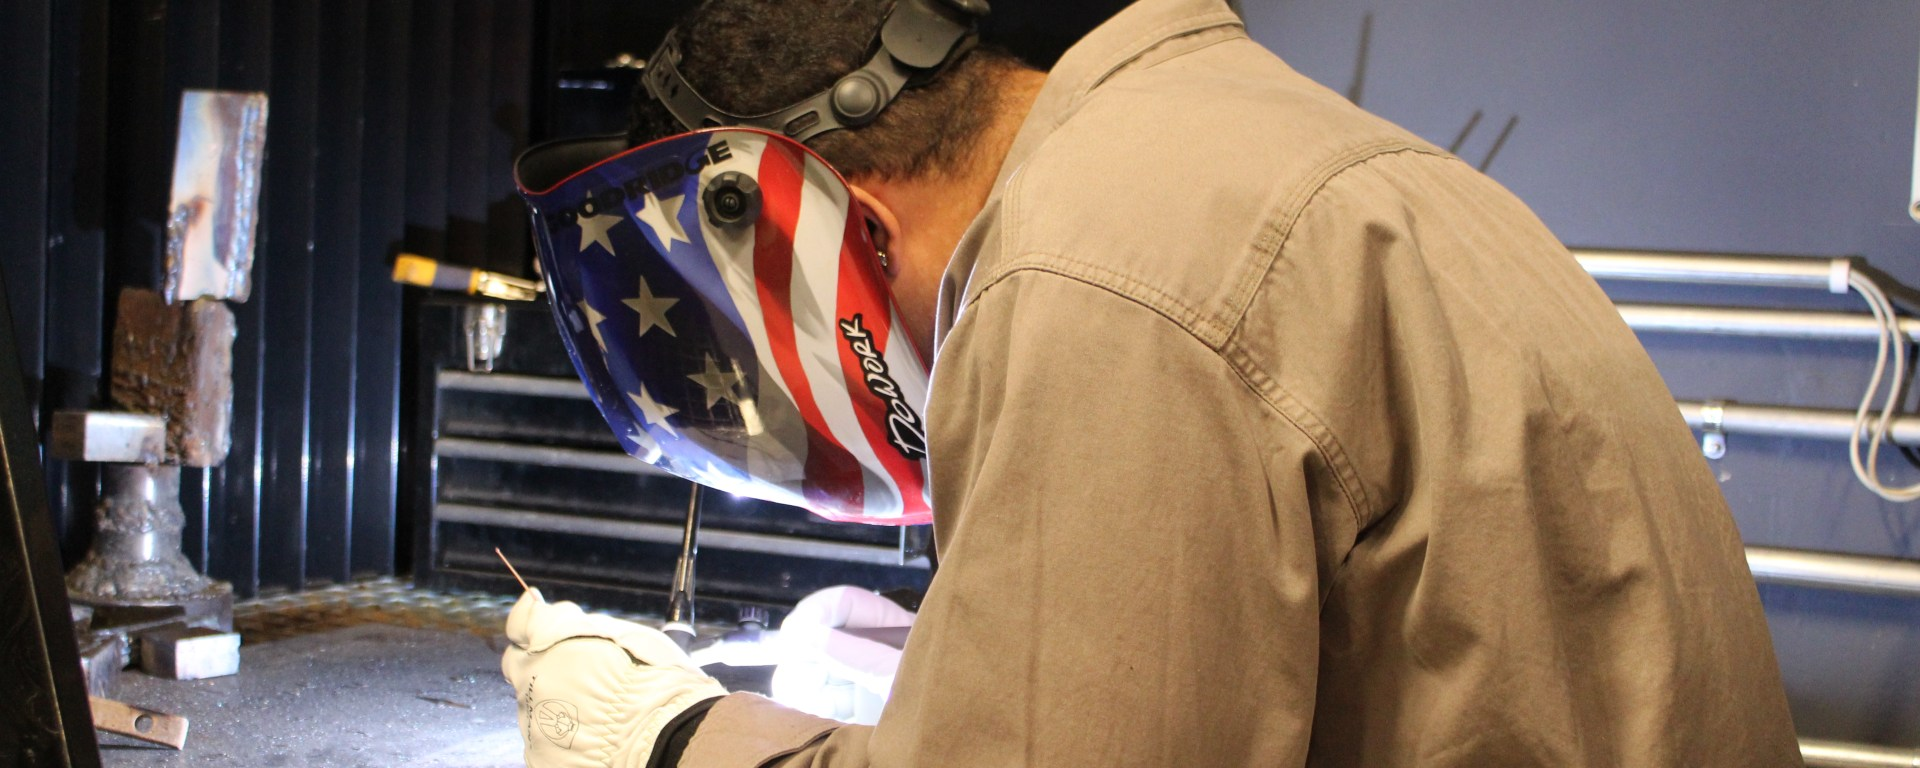 Goodwin college welding program review